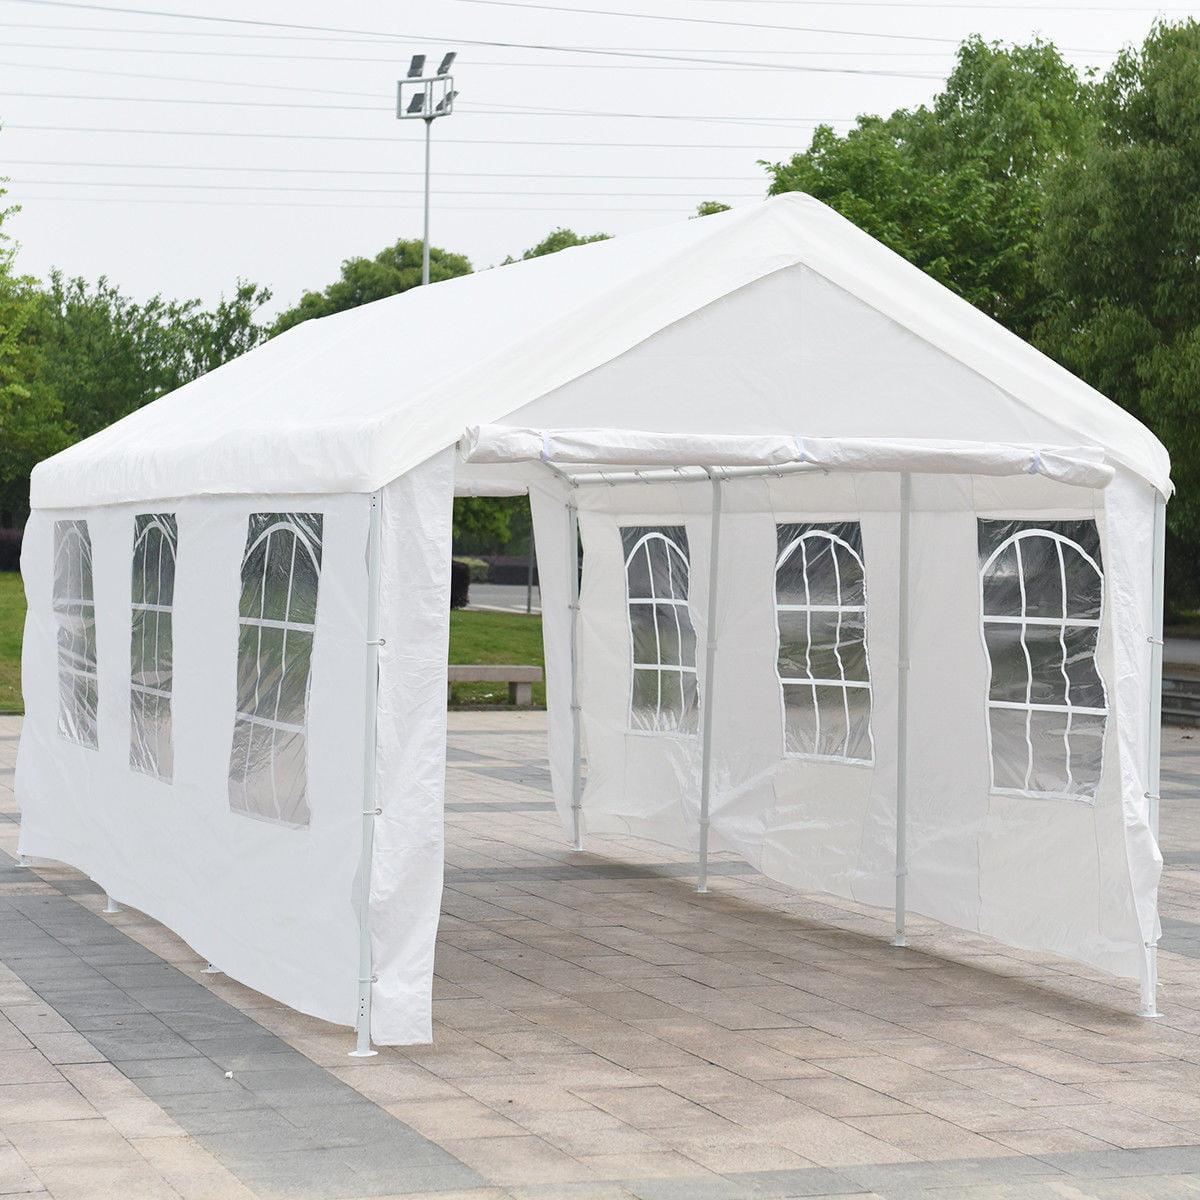 Heavy Duty Carport Canopy Car Wedding Shelter SALE $$$ 20/'x20/' PE Party Tent